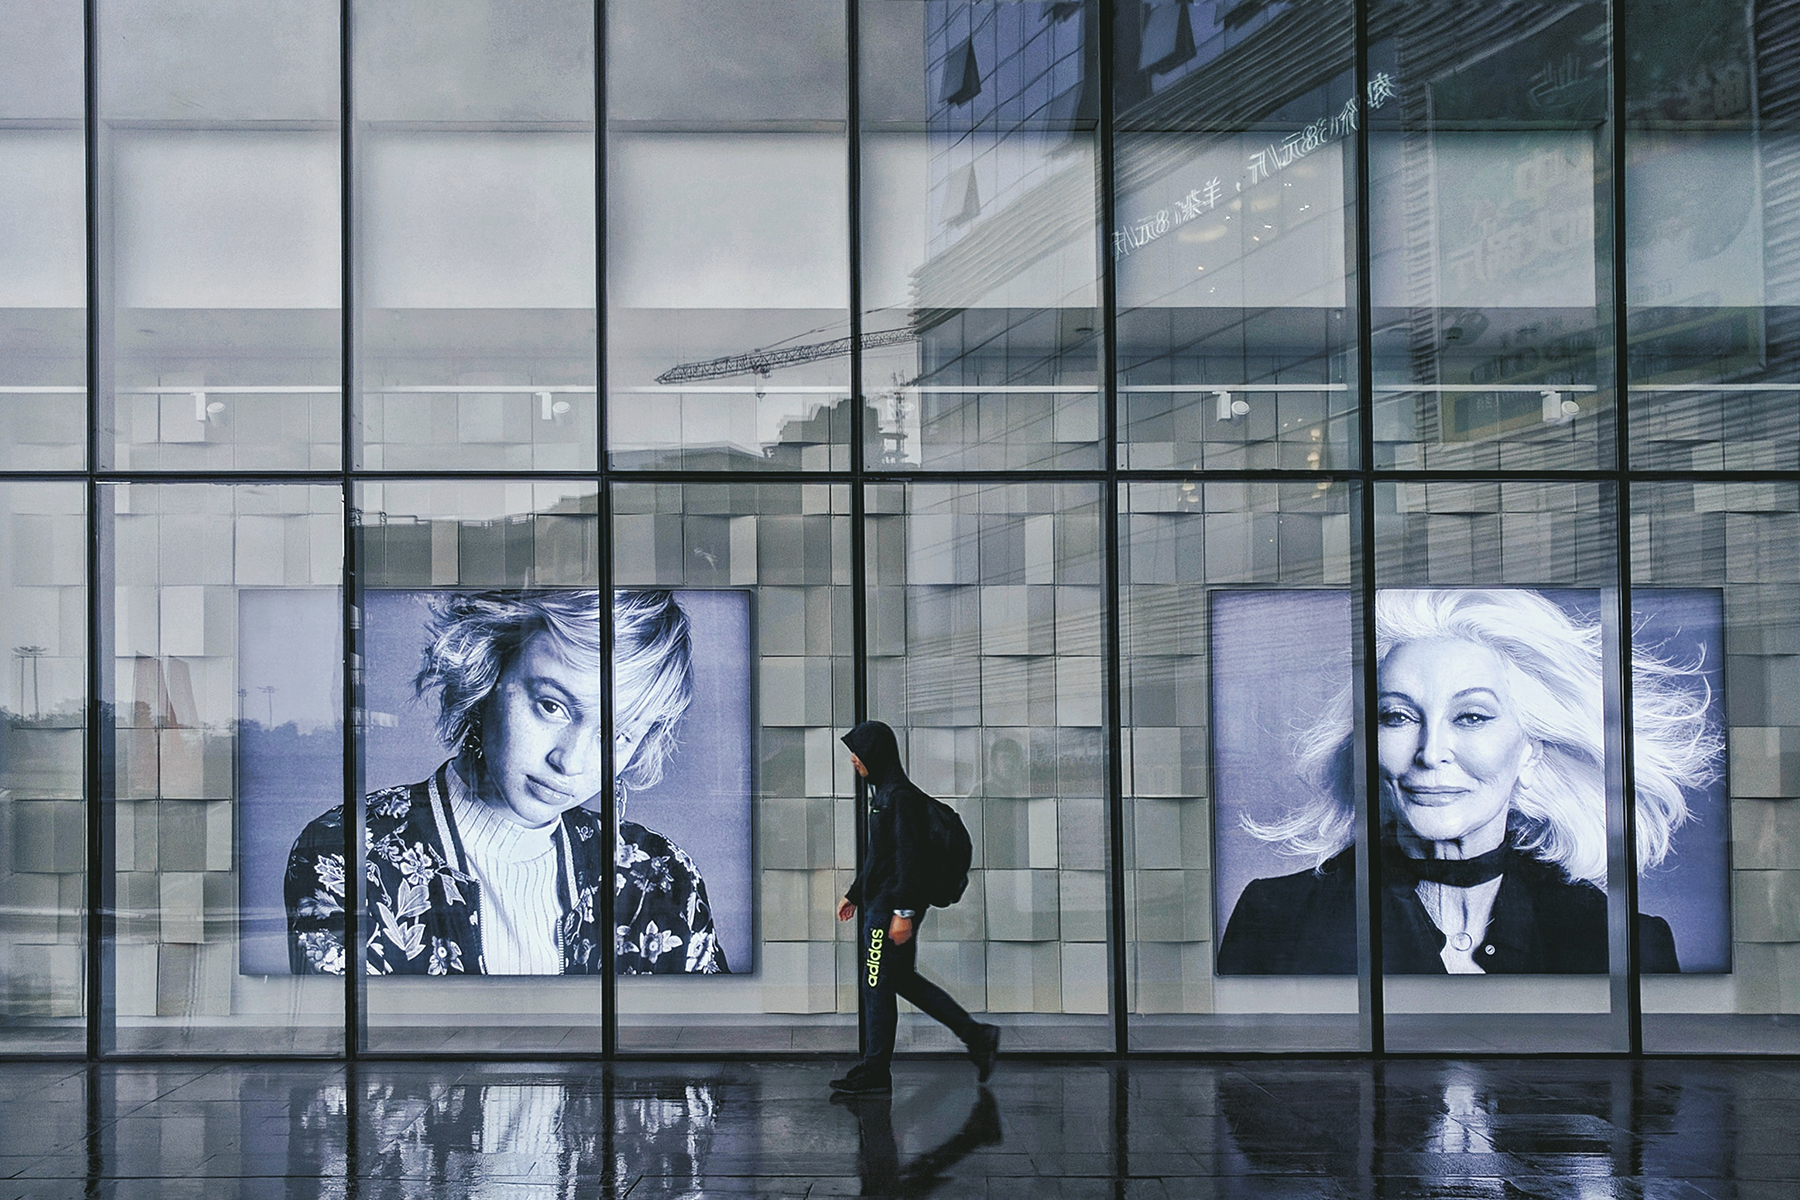 window film retail advertising example